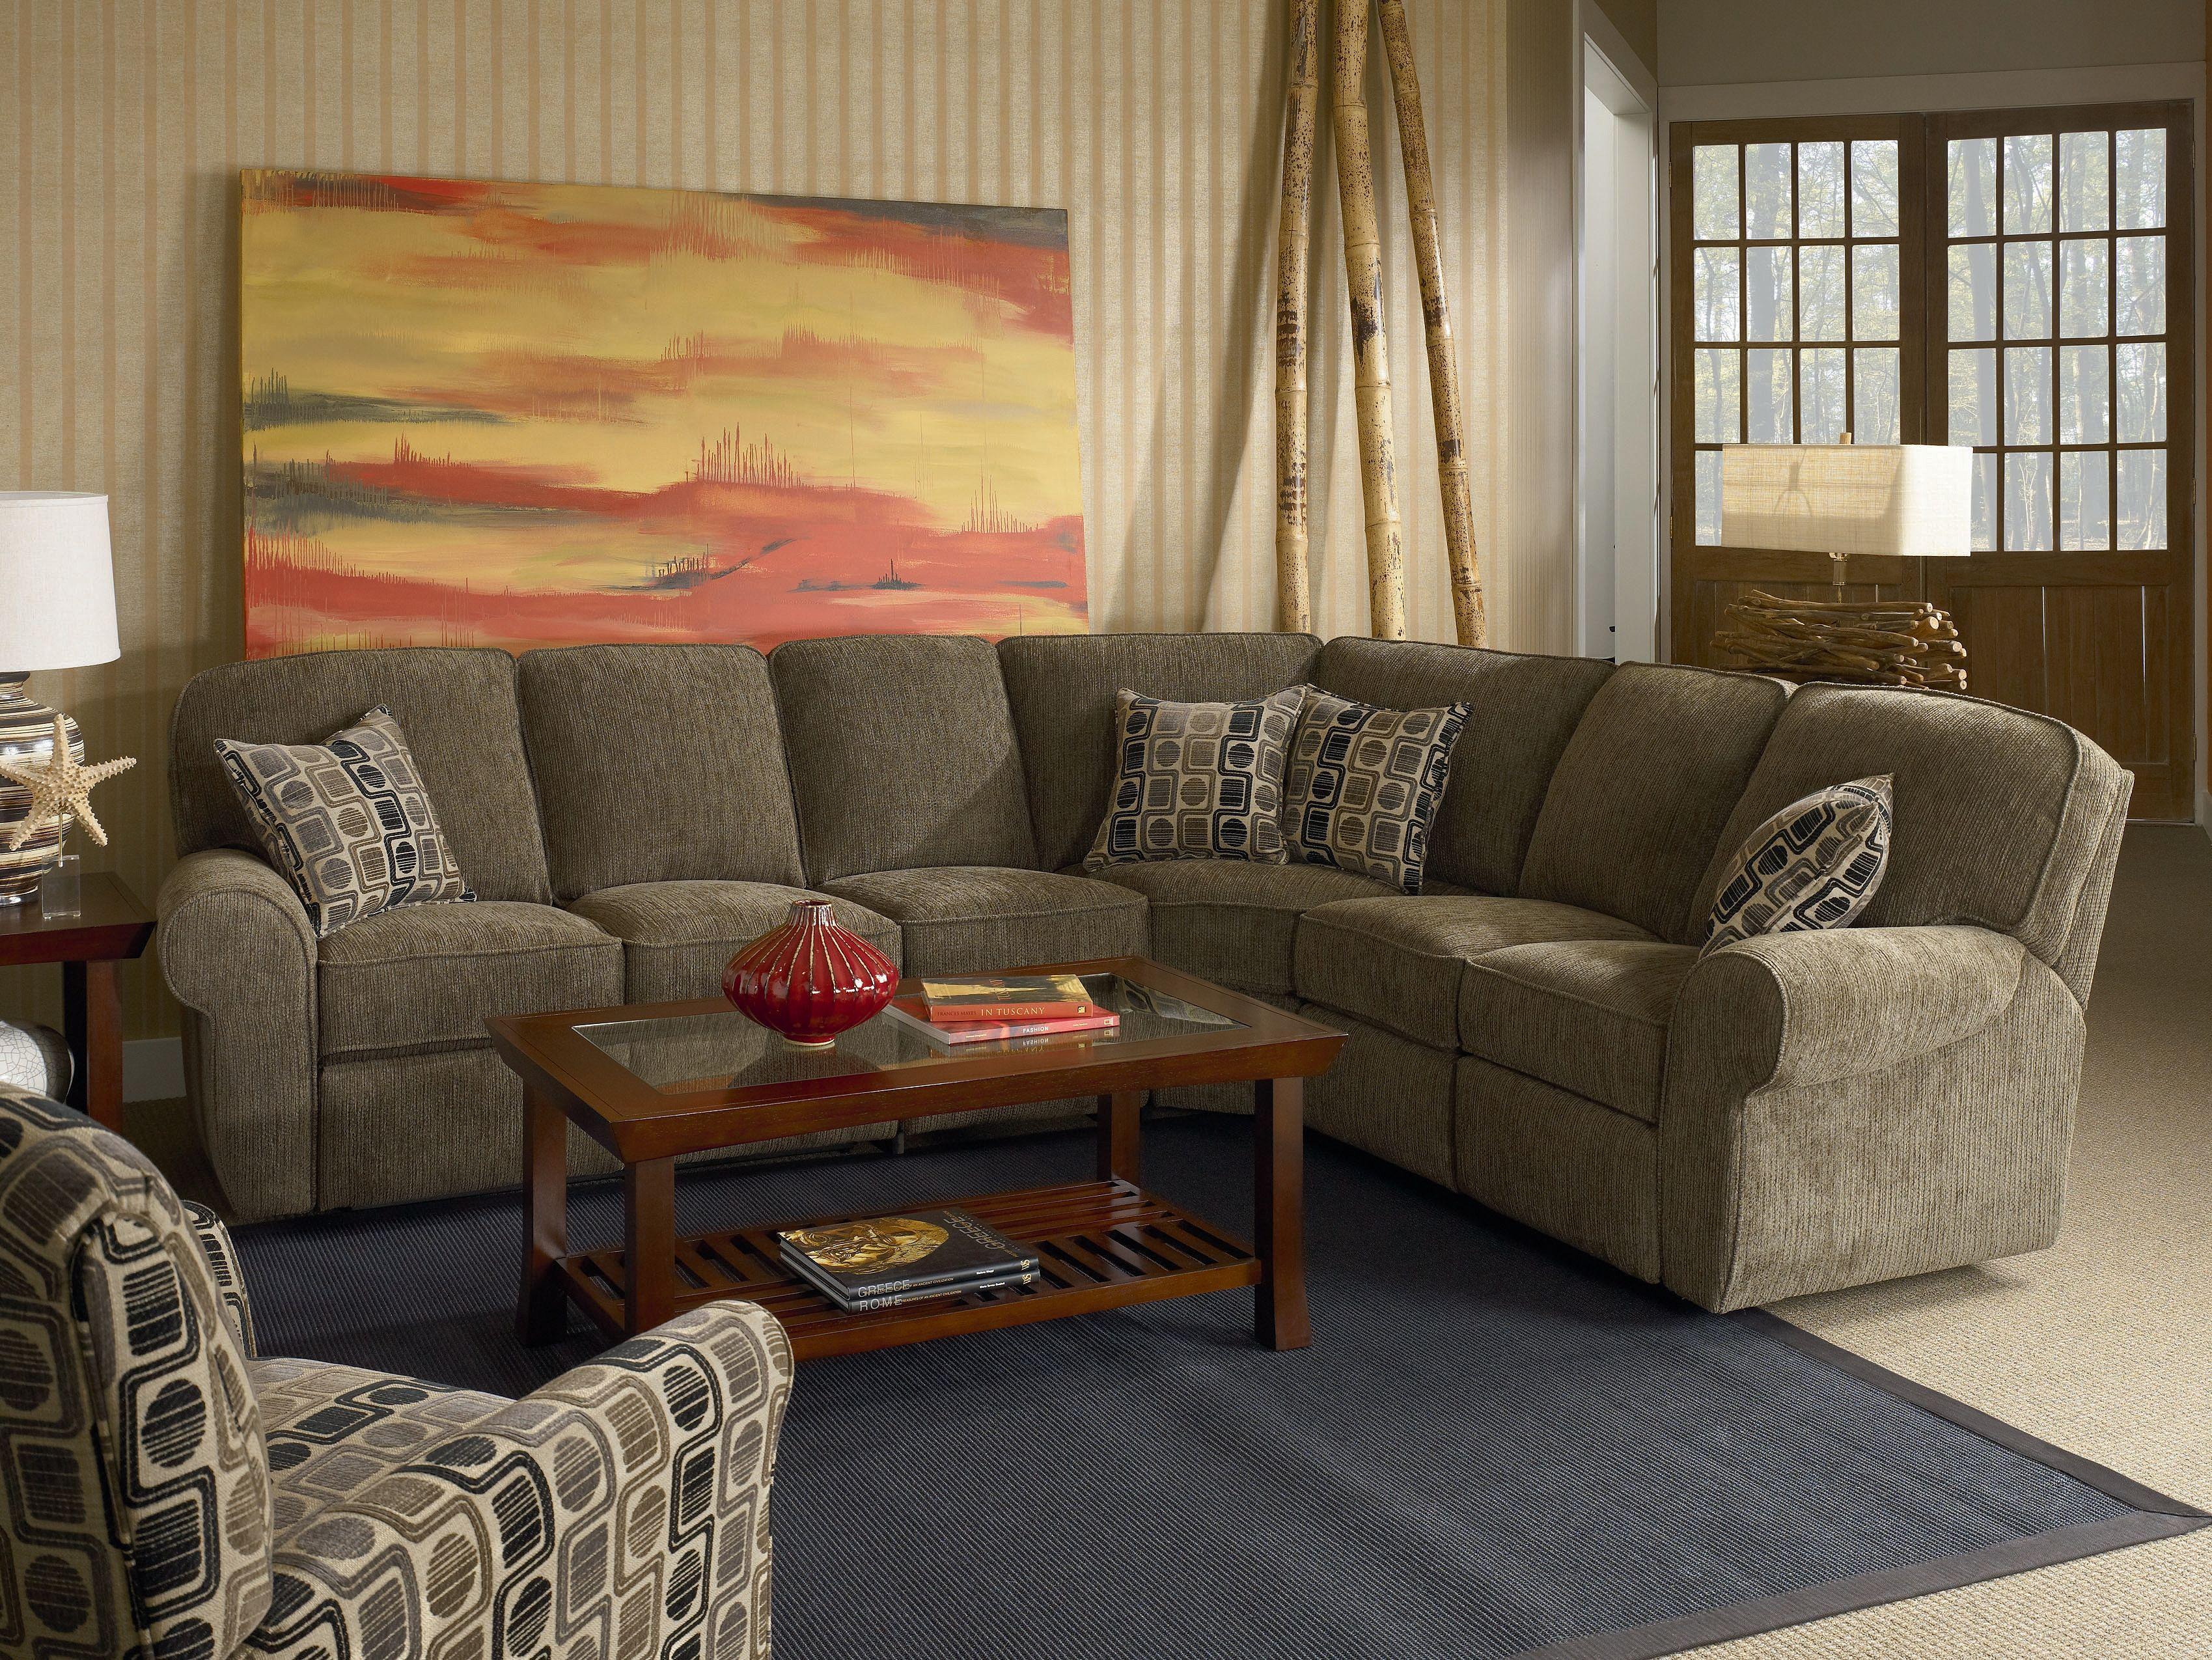 Lane Megan 4 Piece Reclining Sectional Sofa